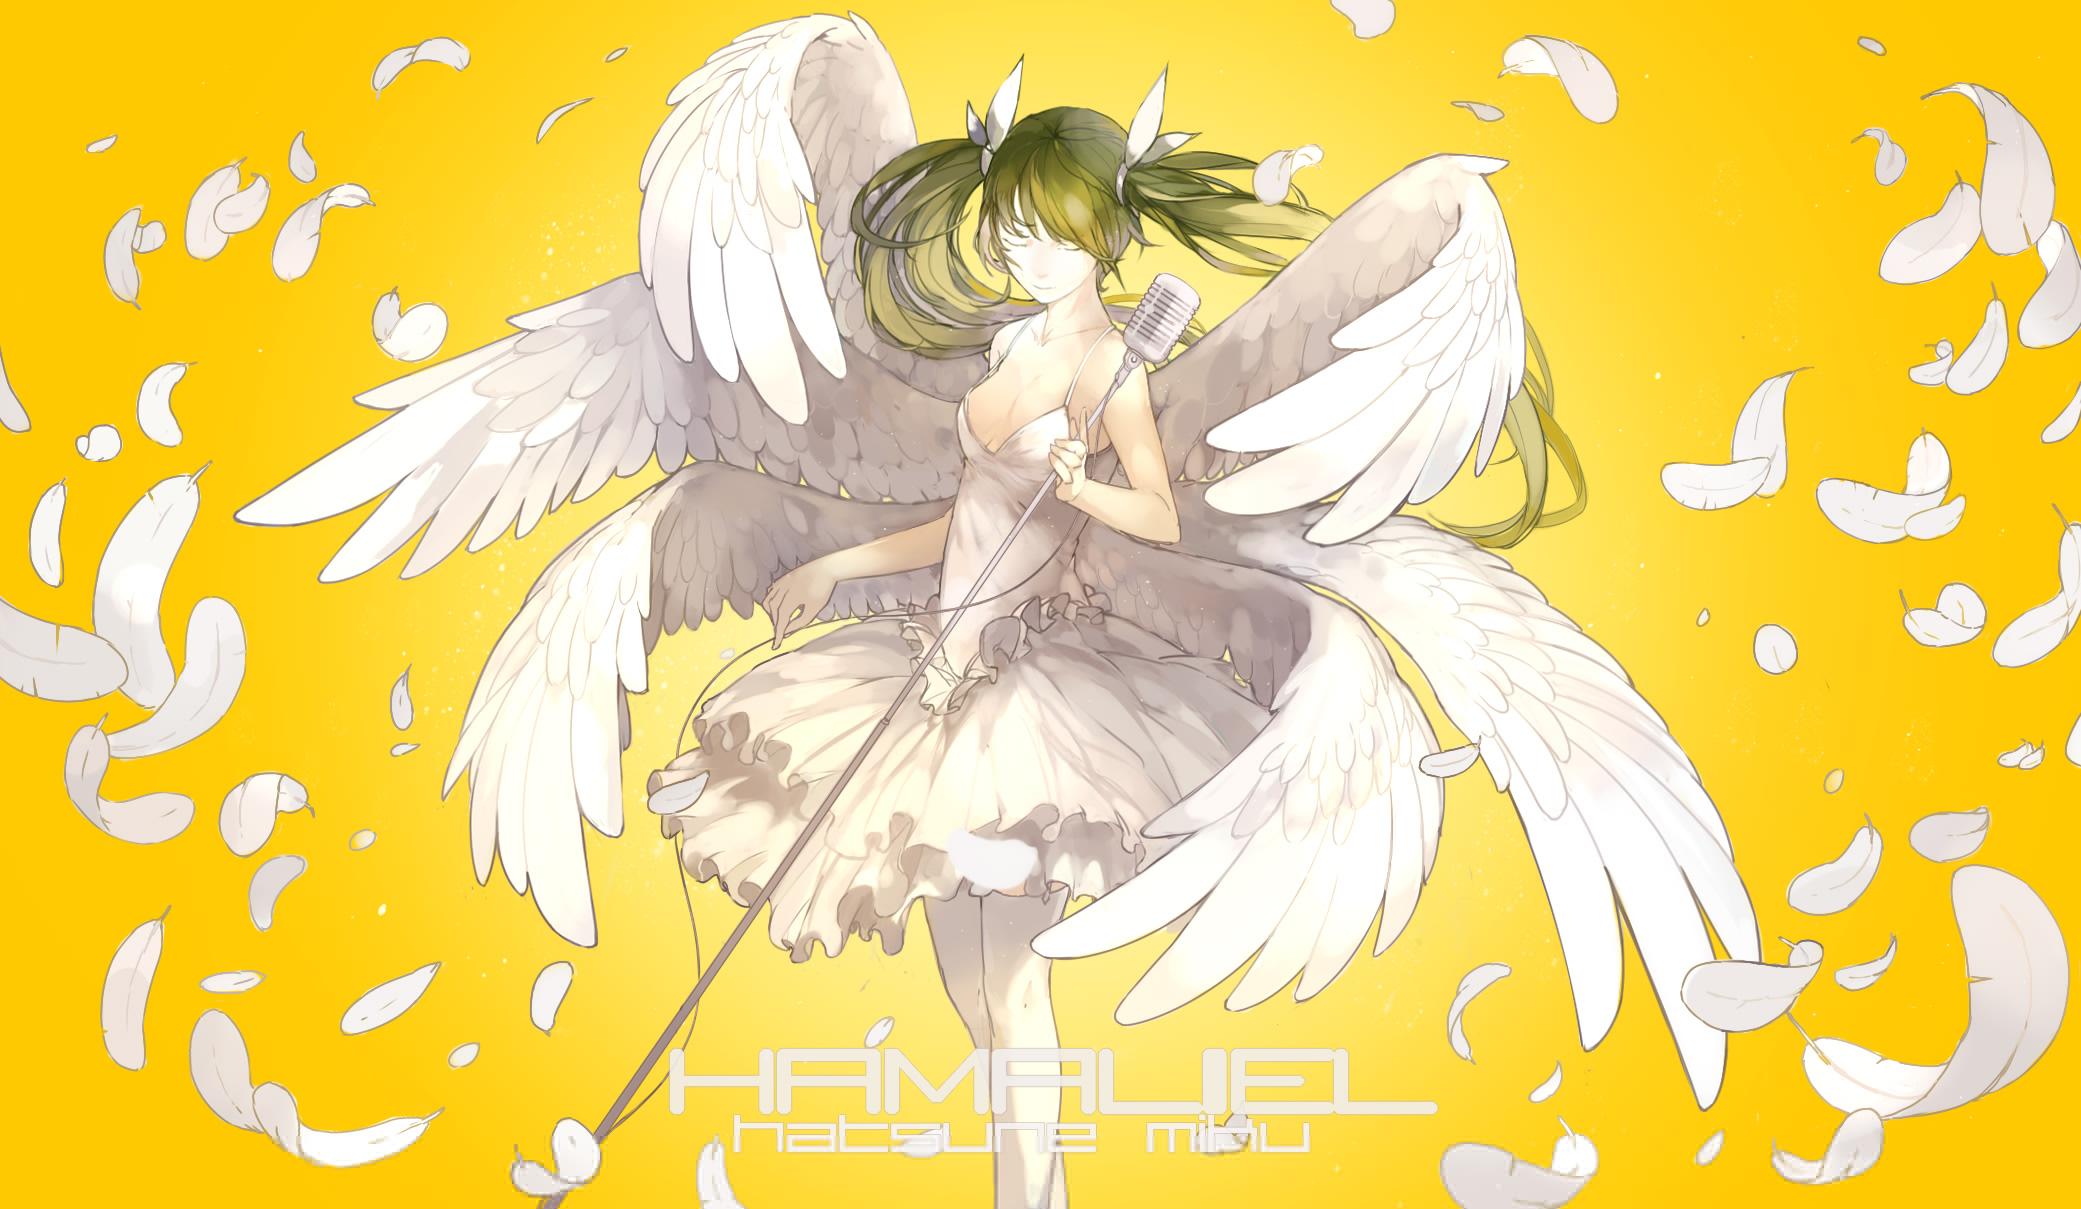 hatsune miku angel wallpapers - photo #17